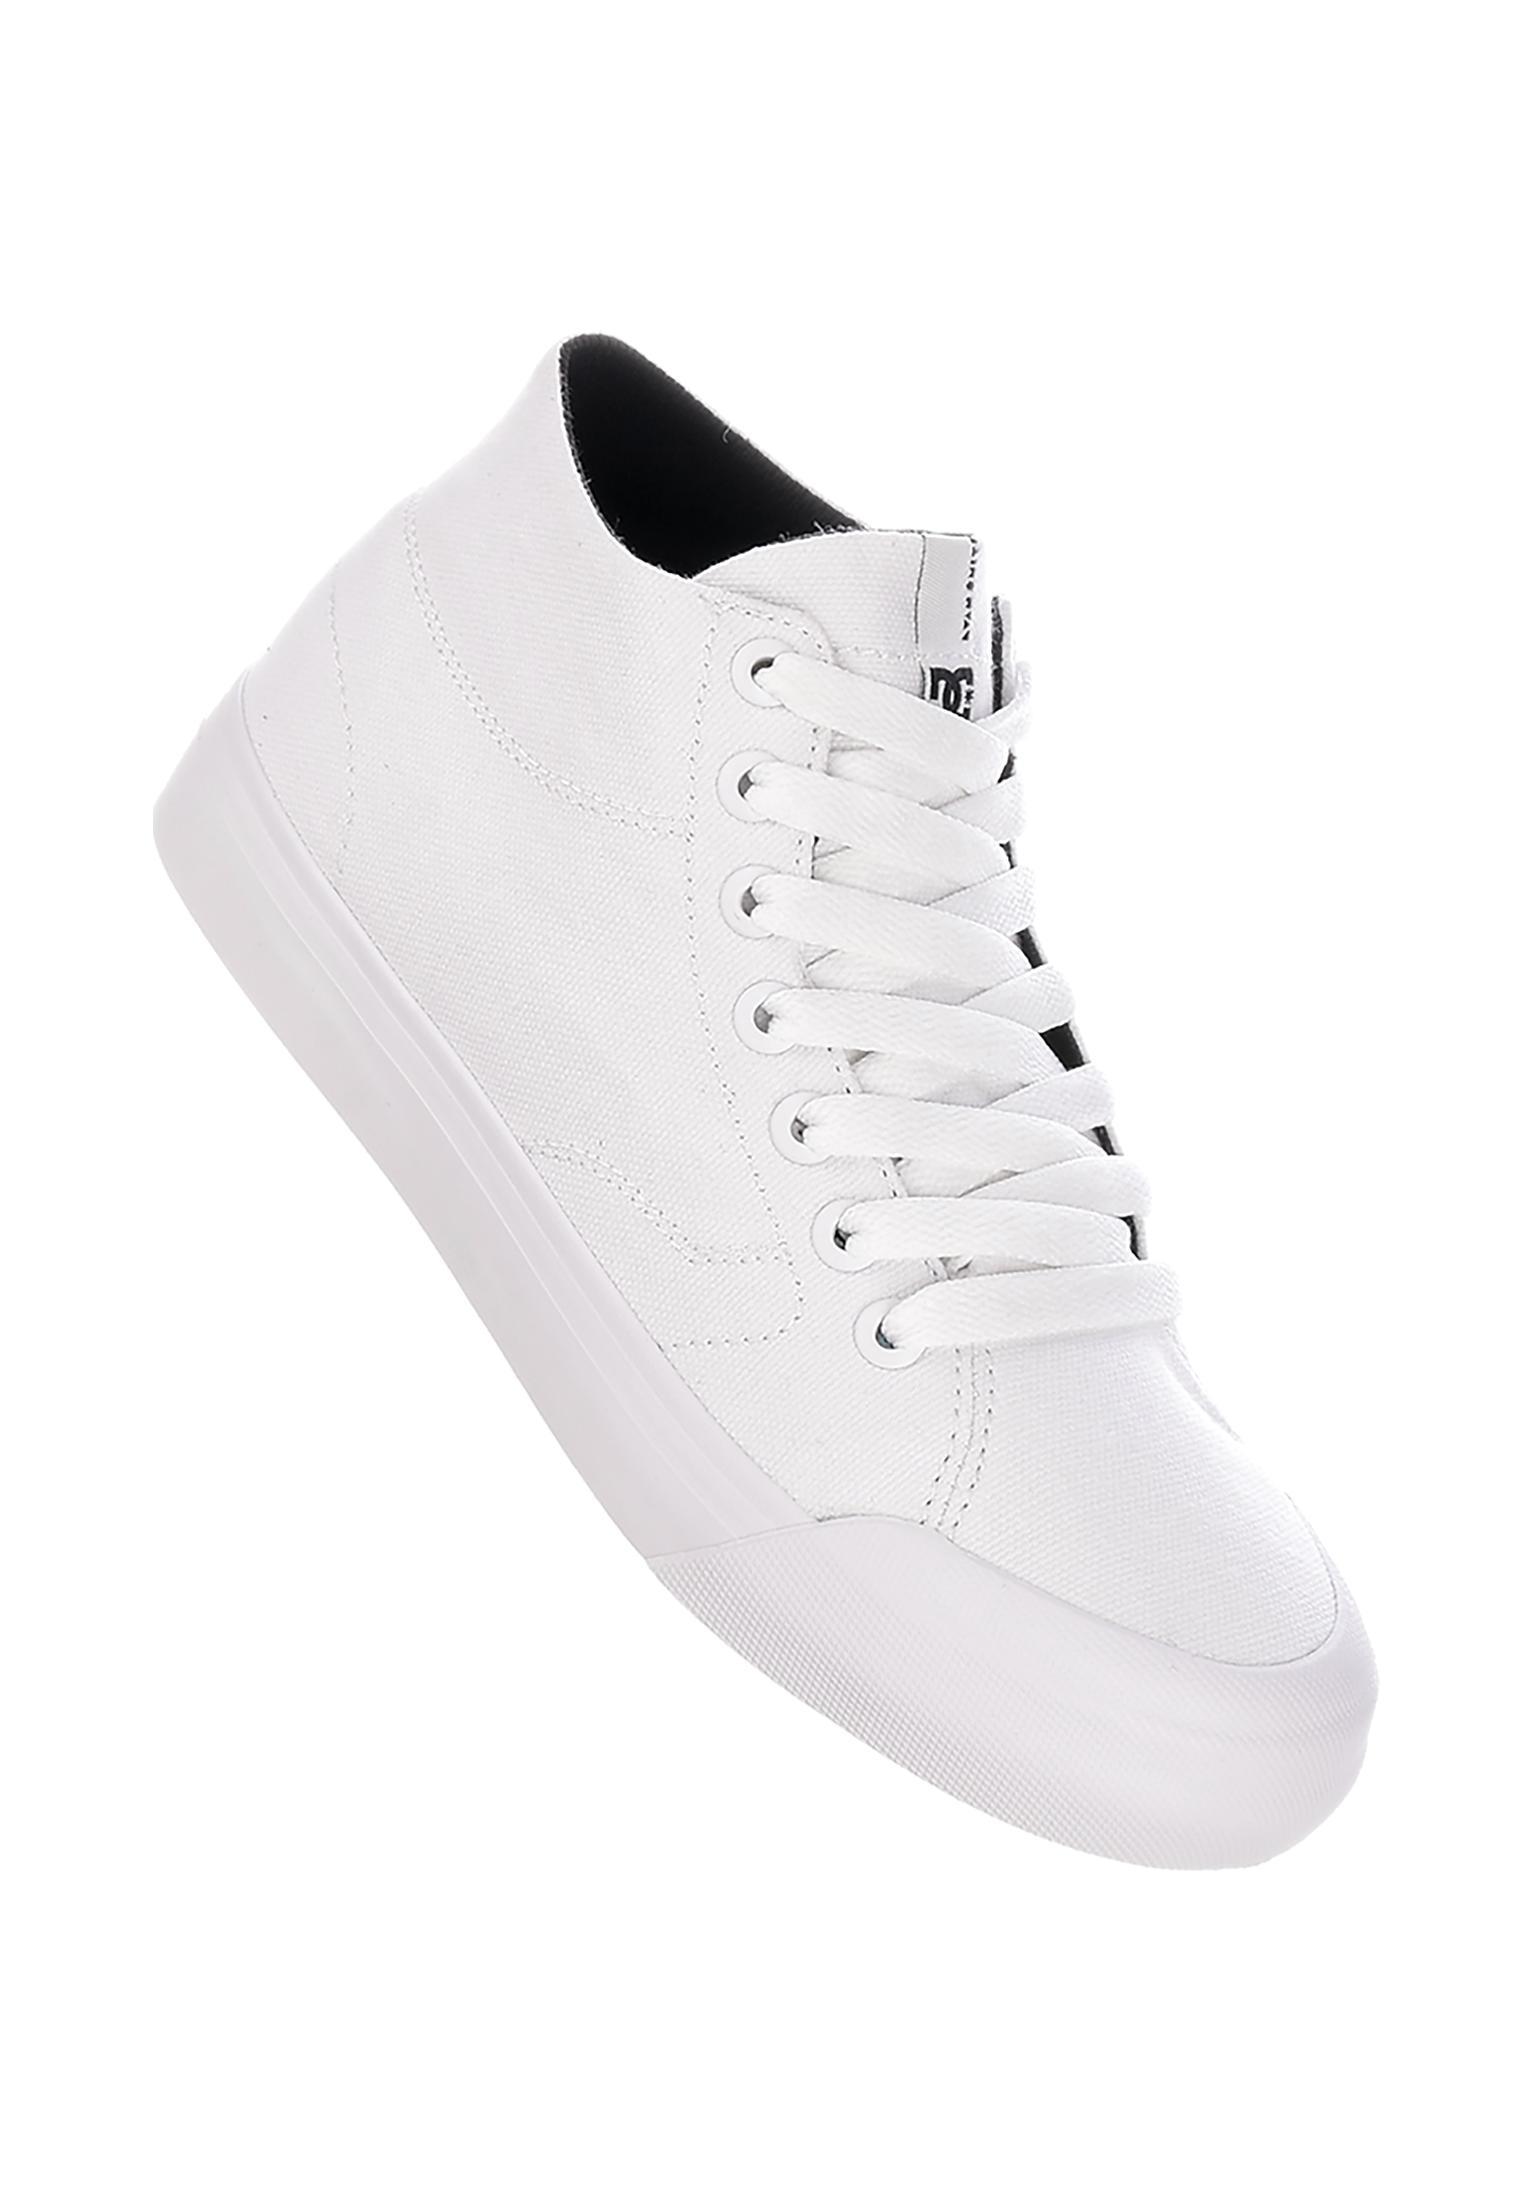 c0929952e152 Evan Hi Zero TX DC Shoes All Shoes in white for Women   Titus